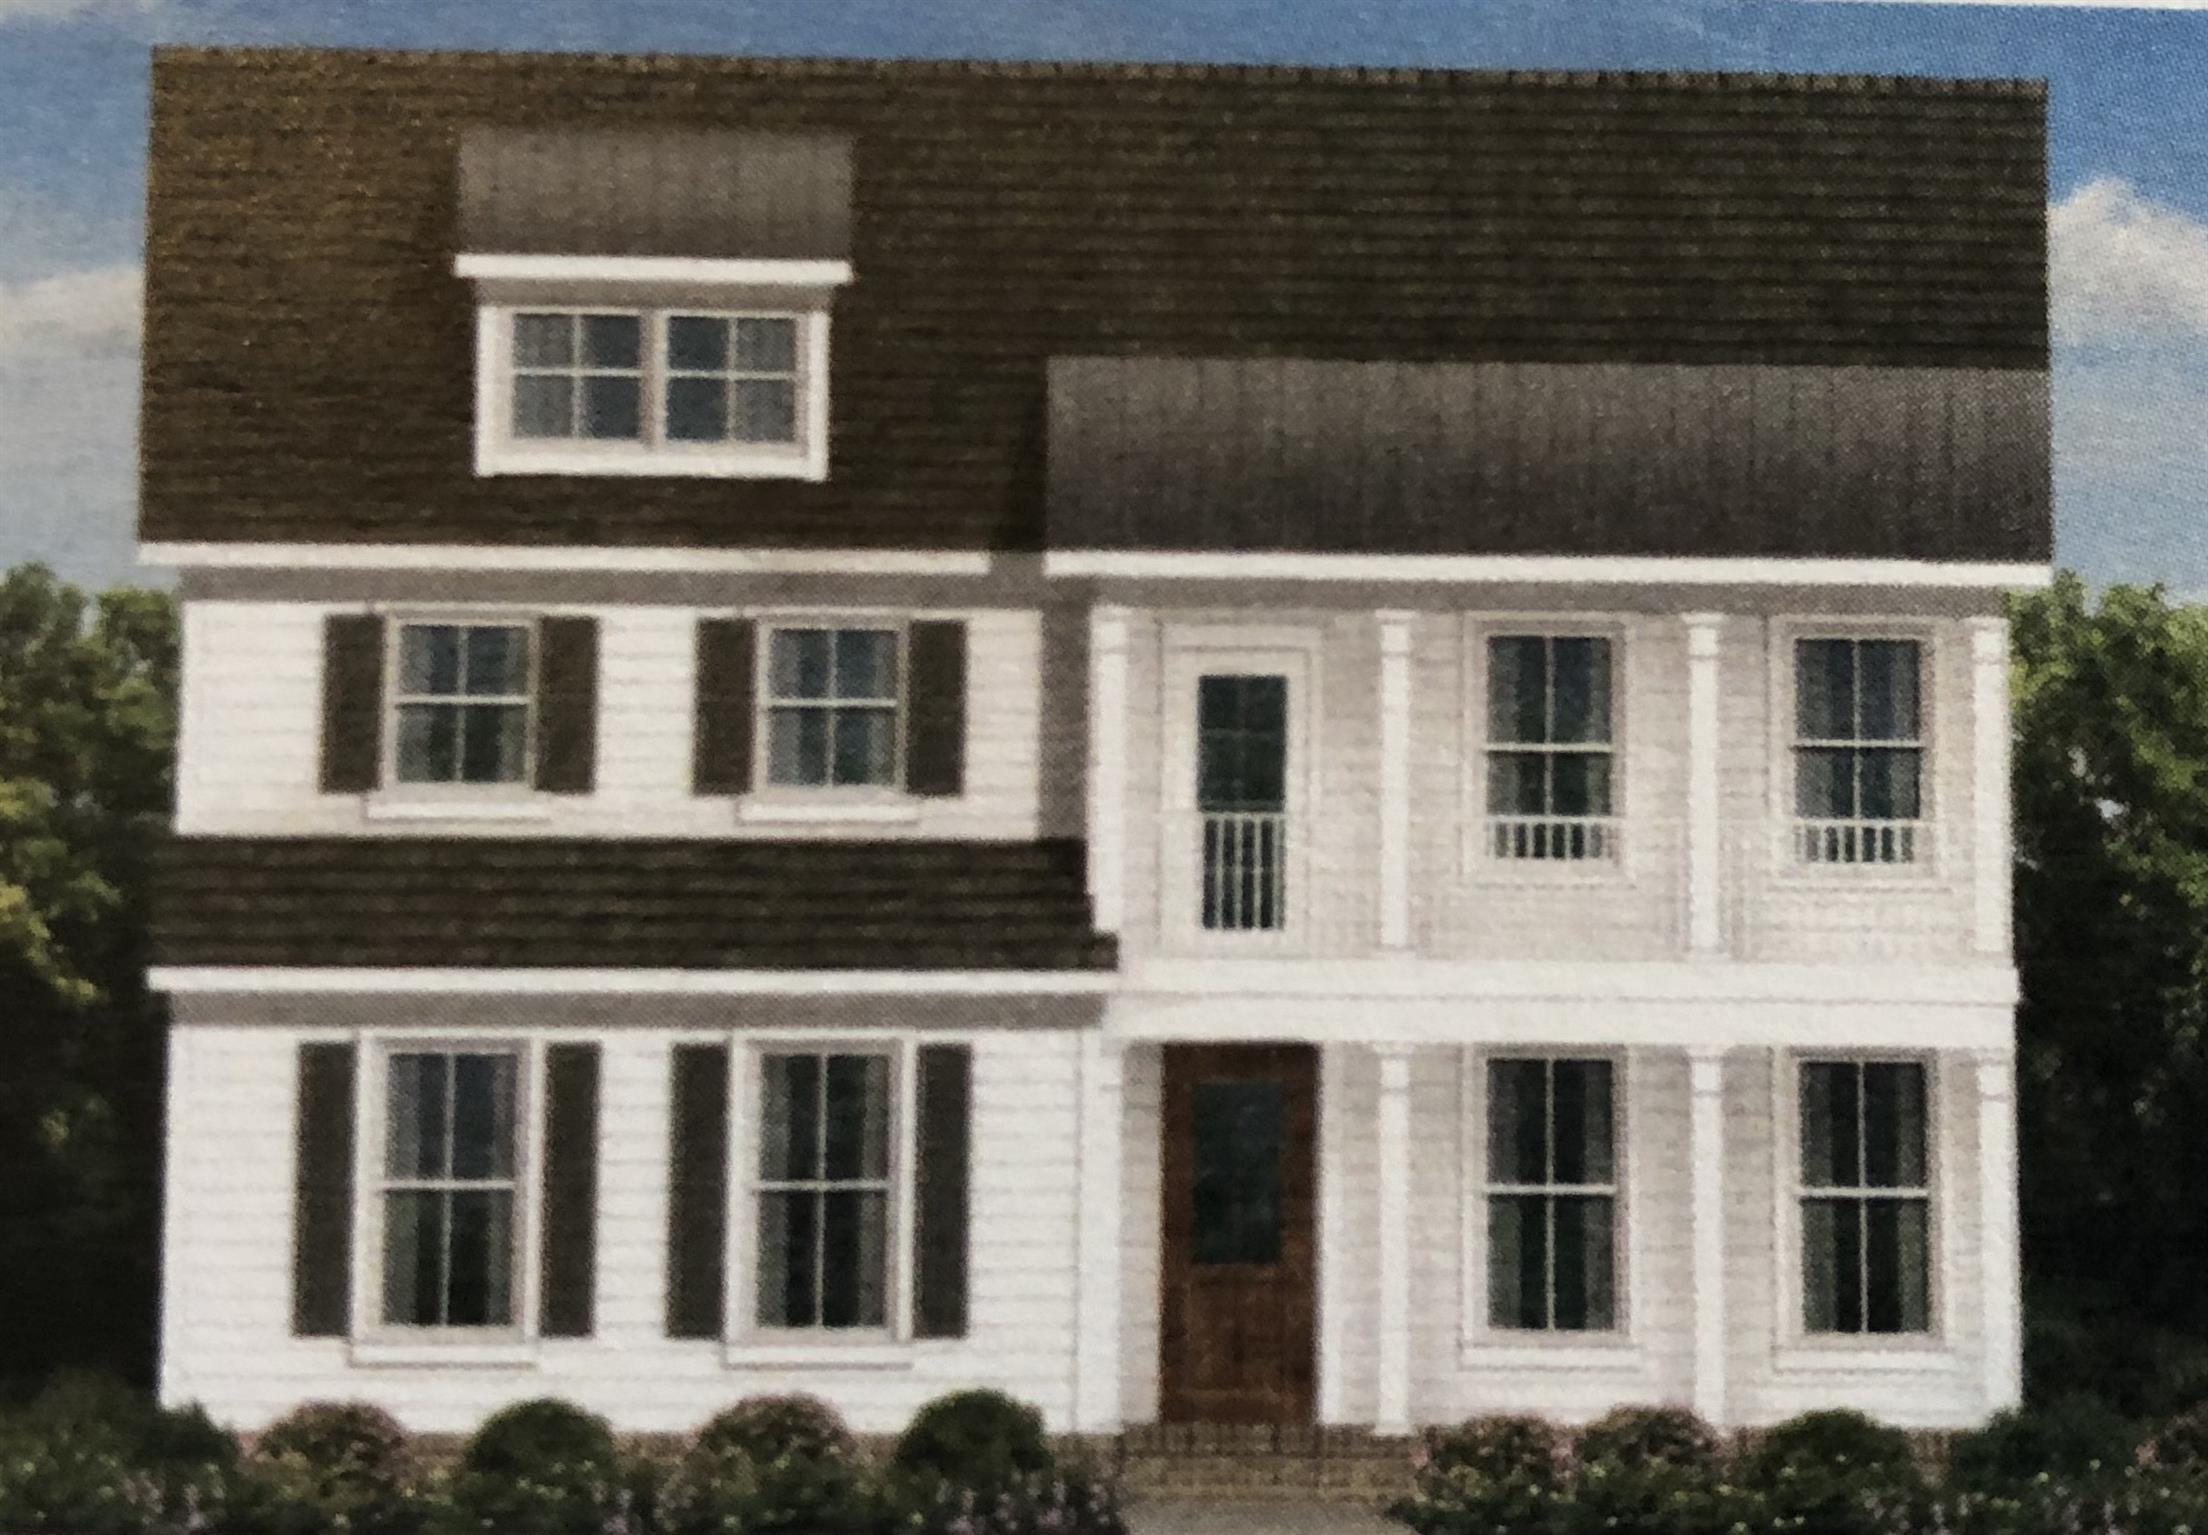 3440 Chinoe Drive- LOT 107, Murfreesboro, TN 37129 - Murfreesboro, TN real estate listing